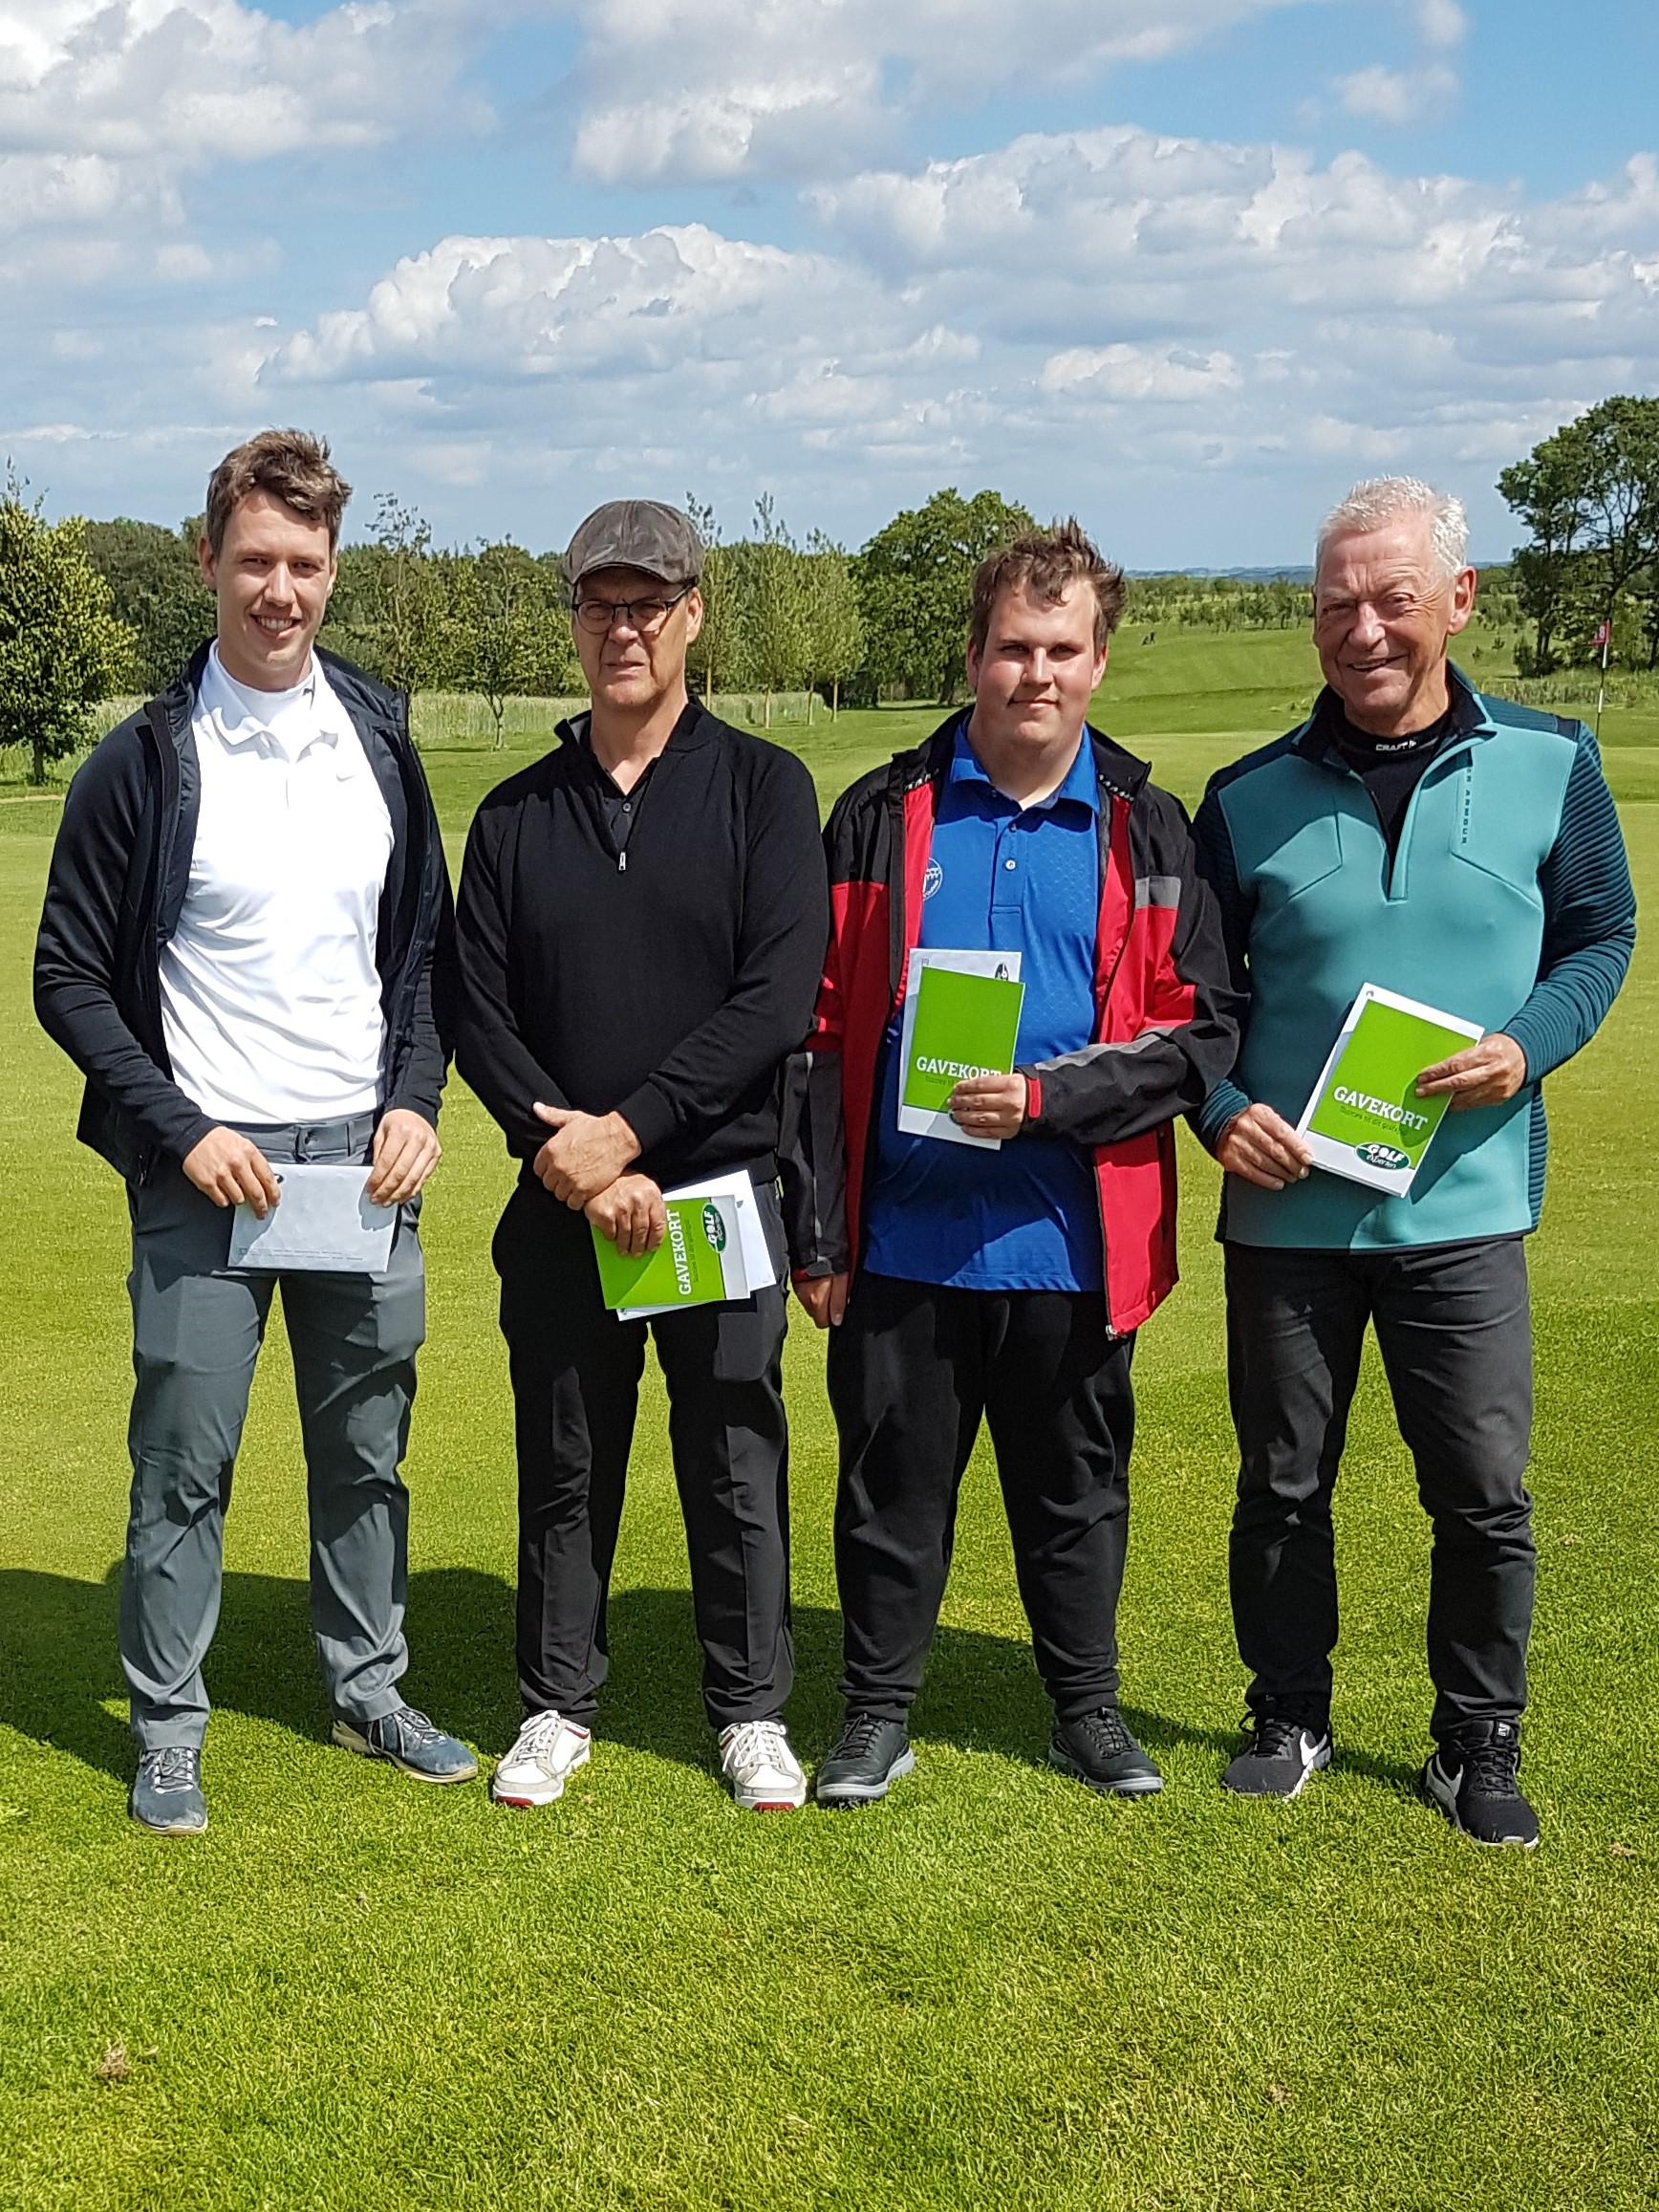 Vinderne i B-rækken: - Gavekort til Golfexperten, Tilst 1. Anders Mørk - 39 point 2. Peter Storm - 33 point 3. Mikkel Thorsen - 32 point 4. John A. Bak - 30 point